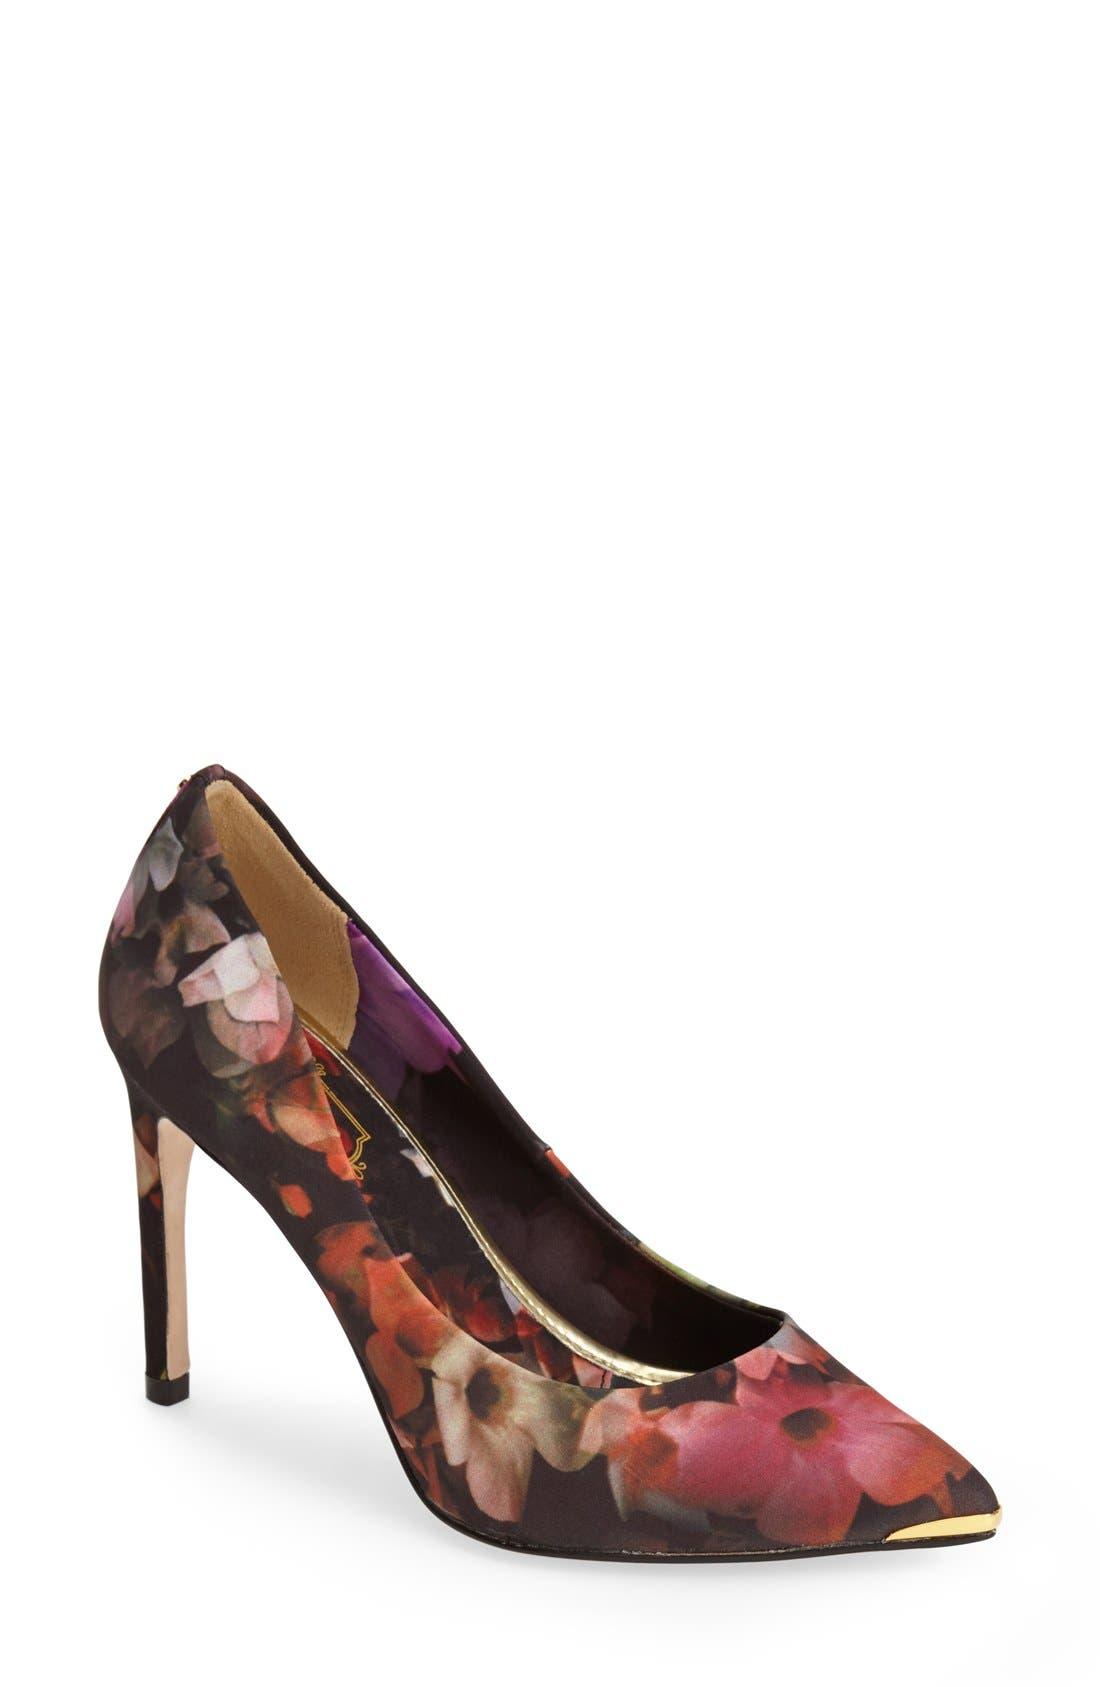 Alternate Image 1 Selected - Ted Baker London 'Neevol' Pointy Toe Pump (Women)